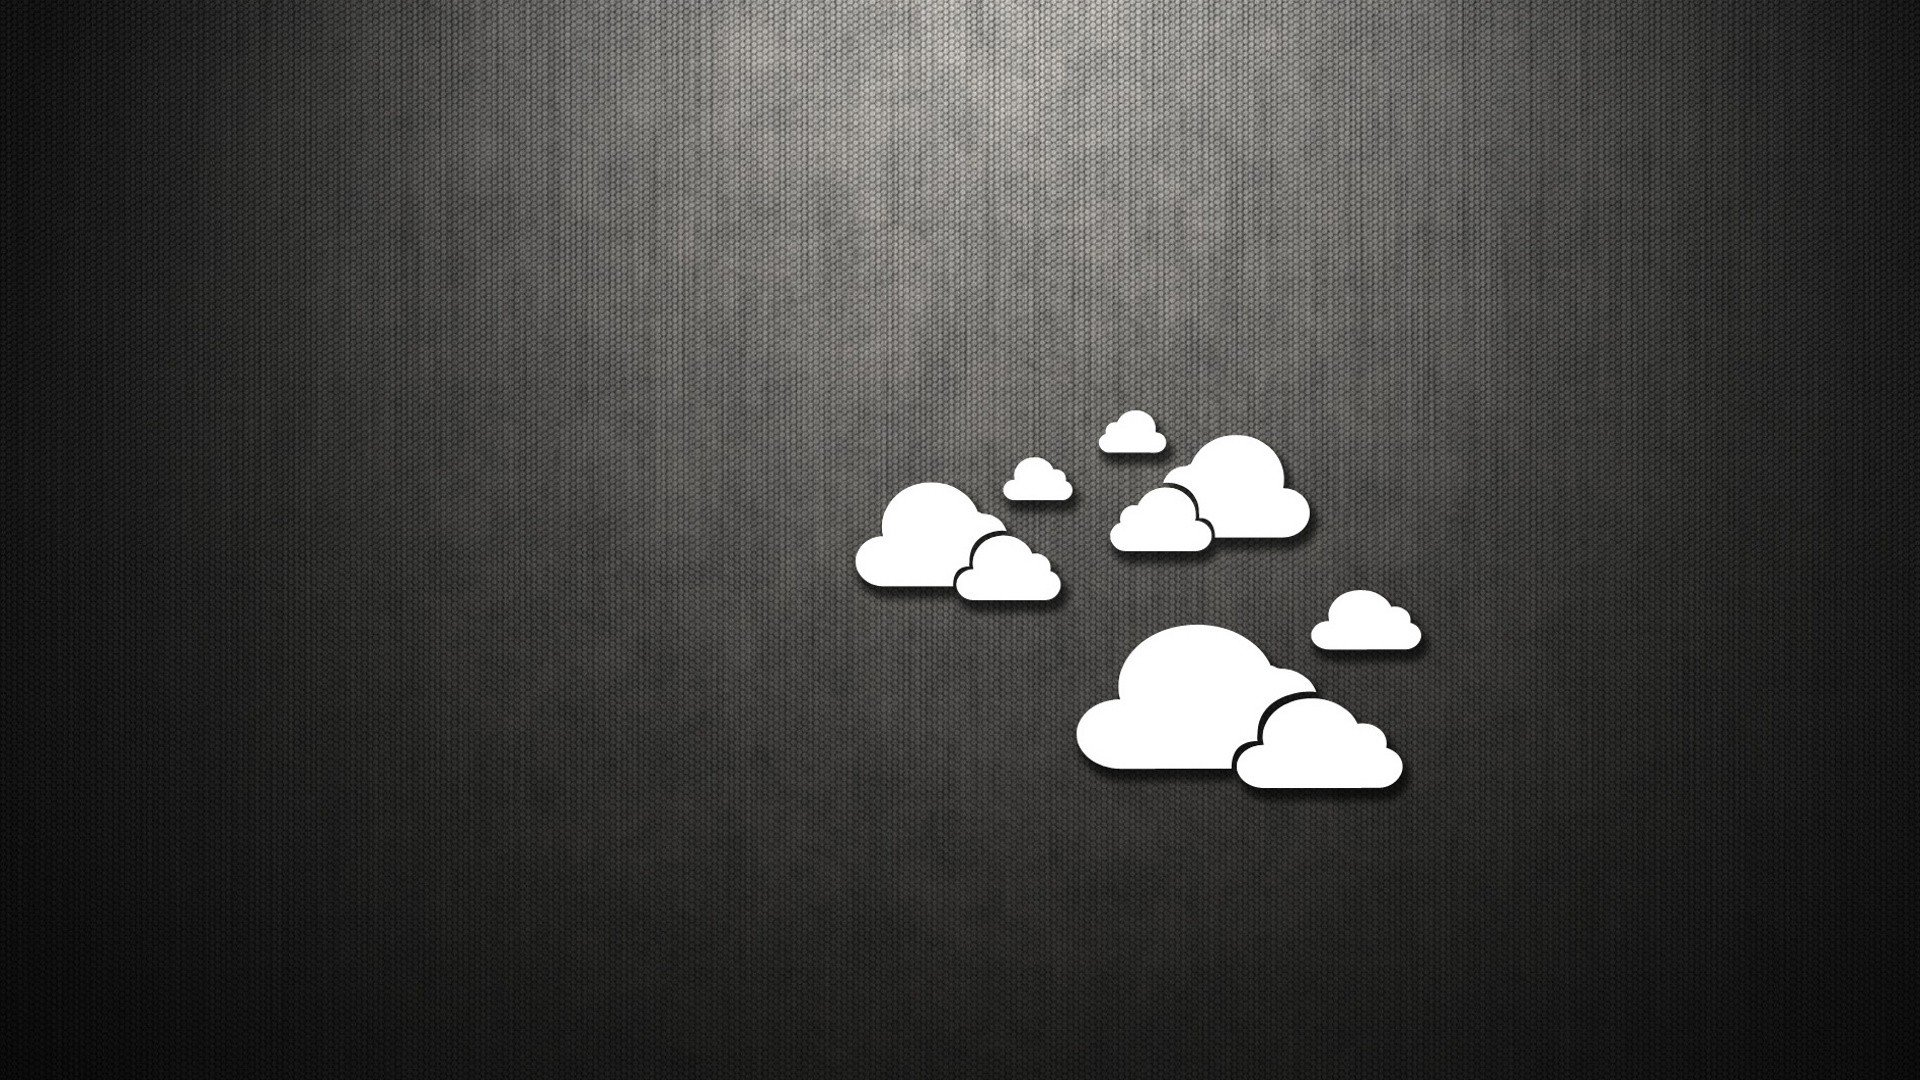 Clouds minimalistic dark metallic simple wallpaper | 1920x1080 | 279866 | WallpaperUP